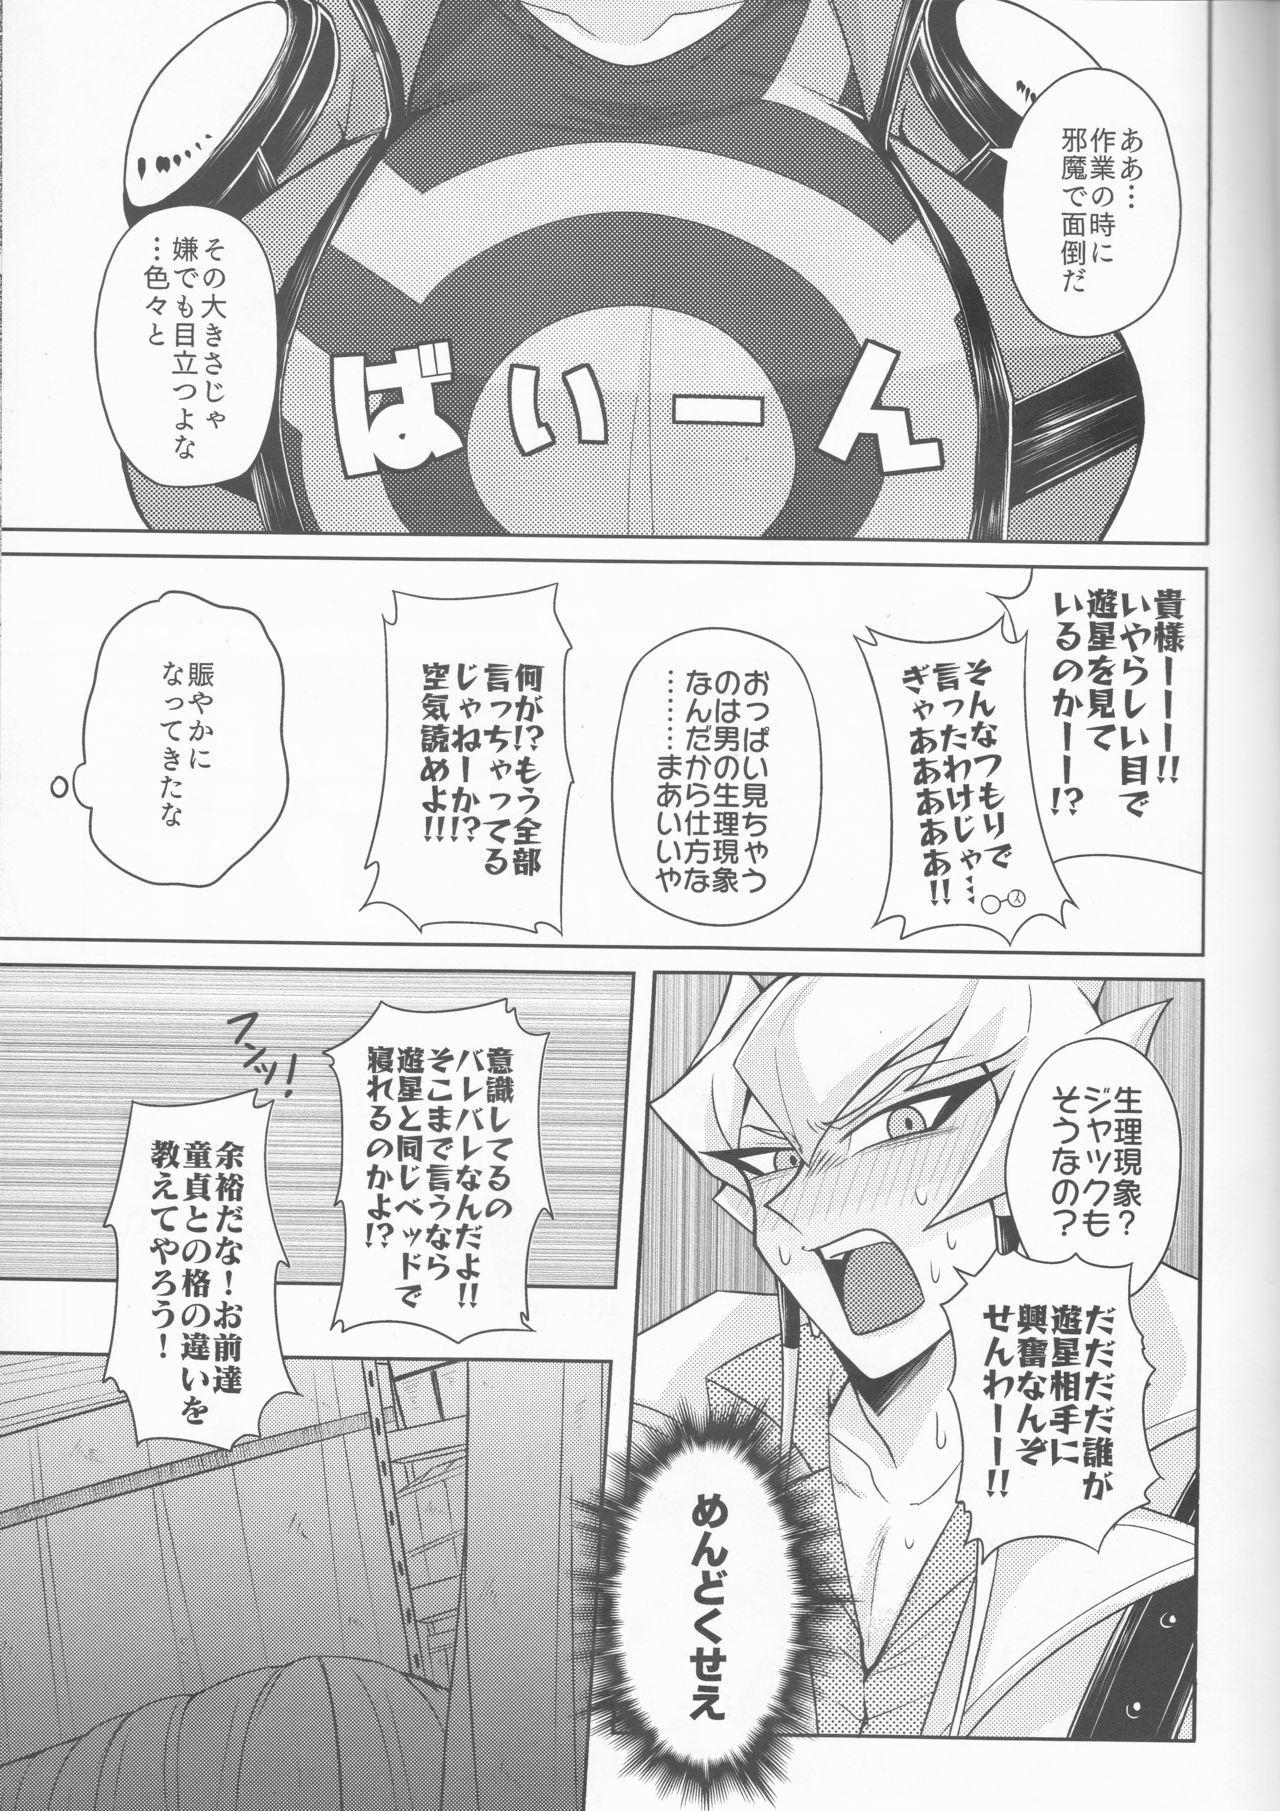 (Chou Ore no Turn 2019) [KINOPOTION (Take Nameko)] King (Mi) to Yusei-chan ♀ (Yu-Gi-Oh! 5D's) 4